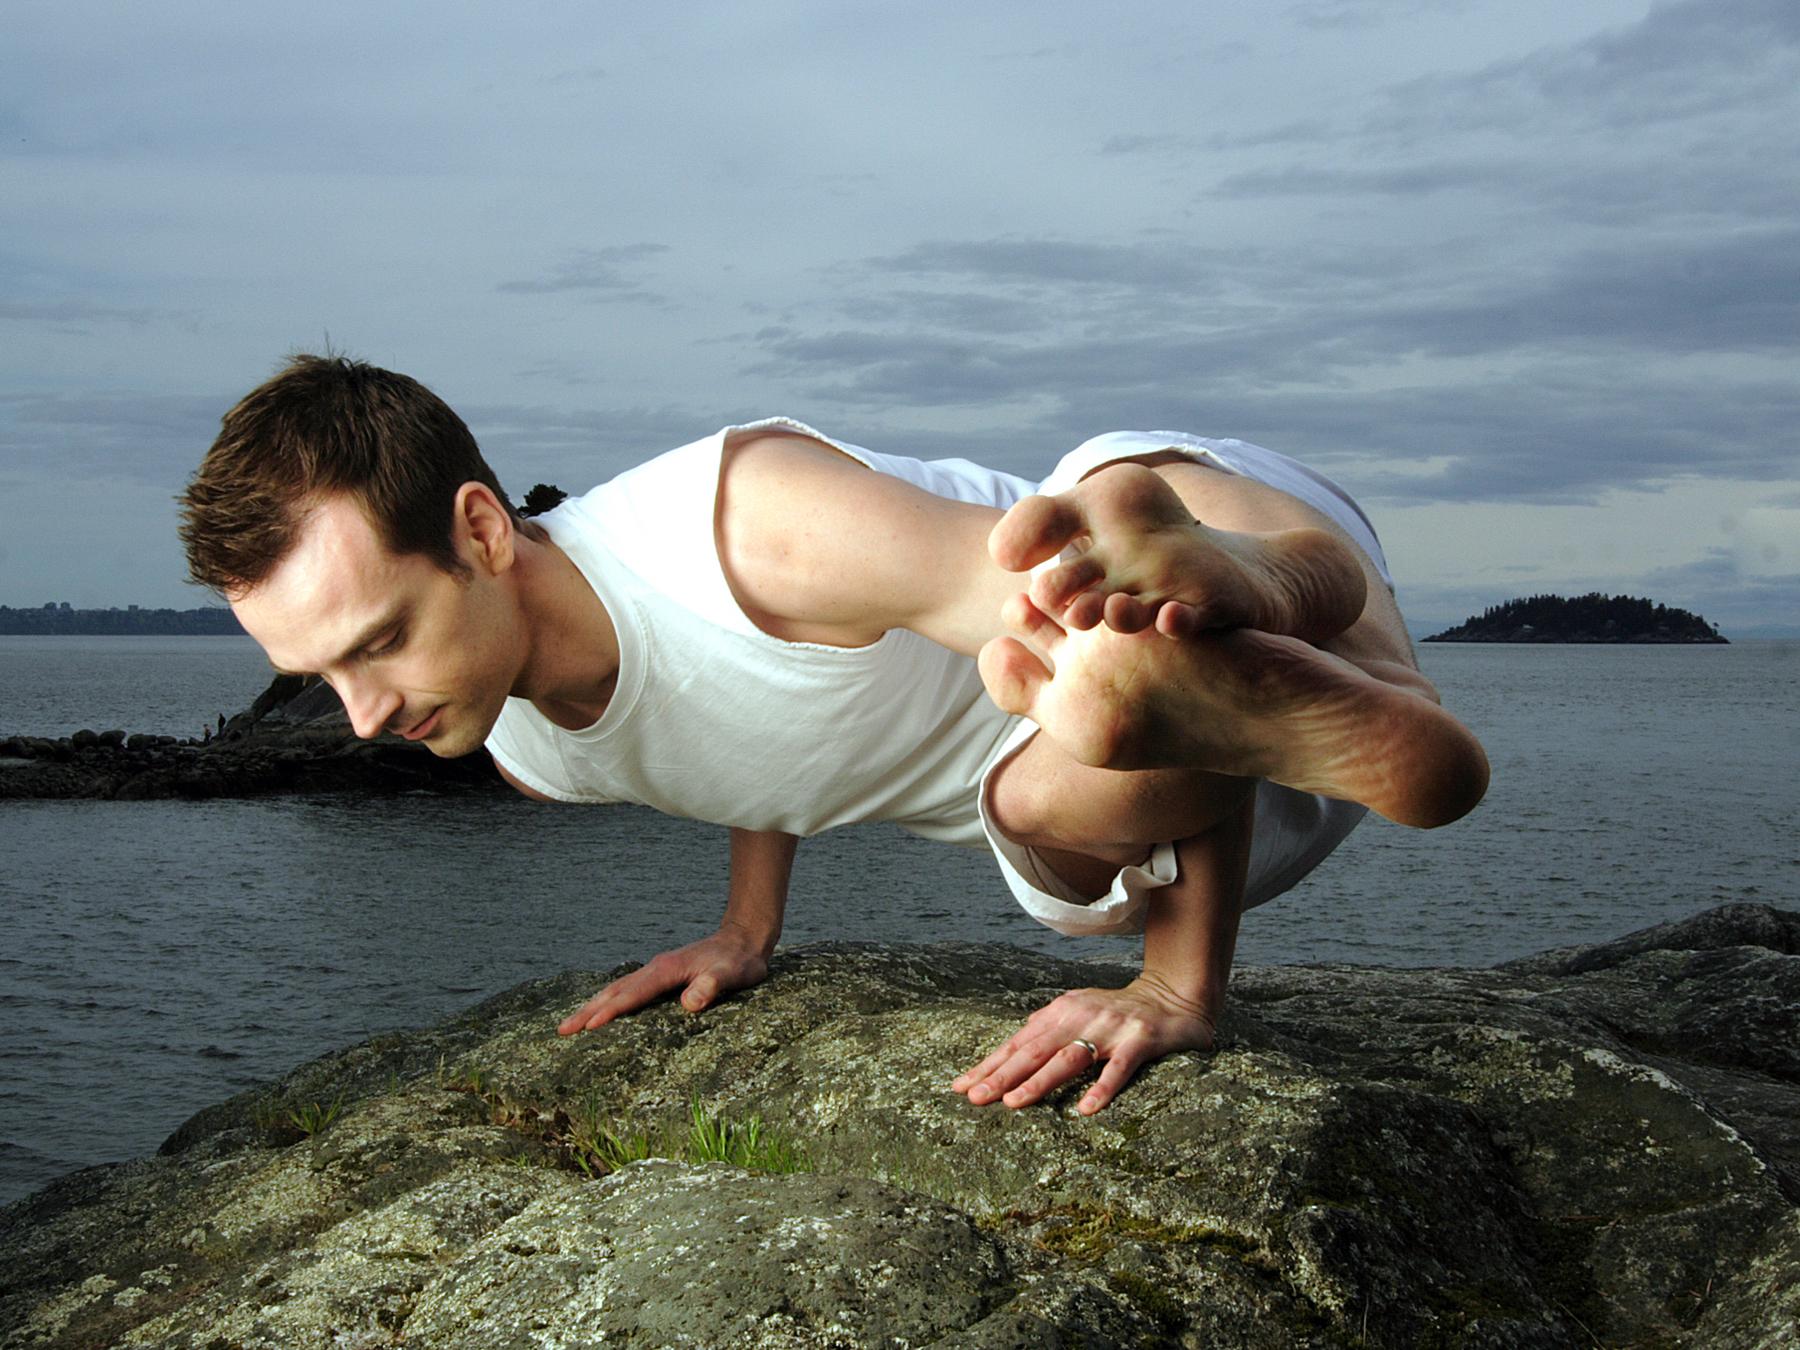 Taking yoga to the next level